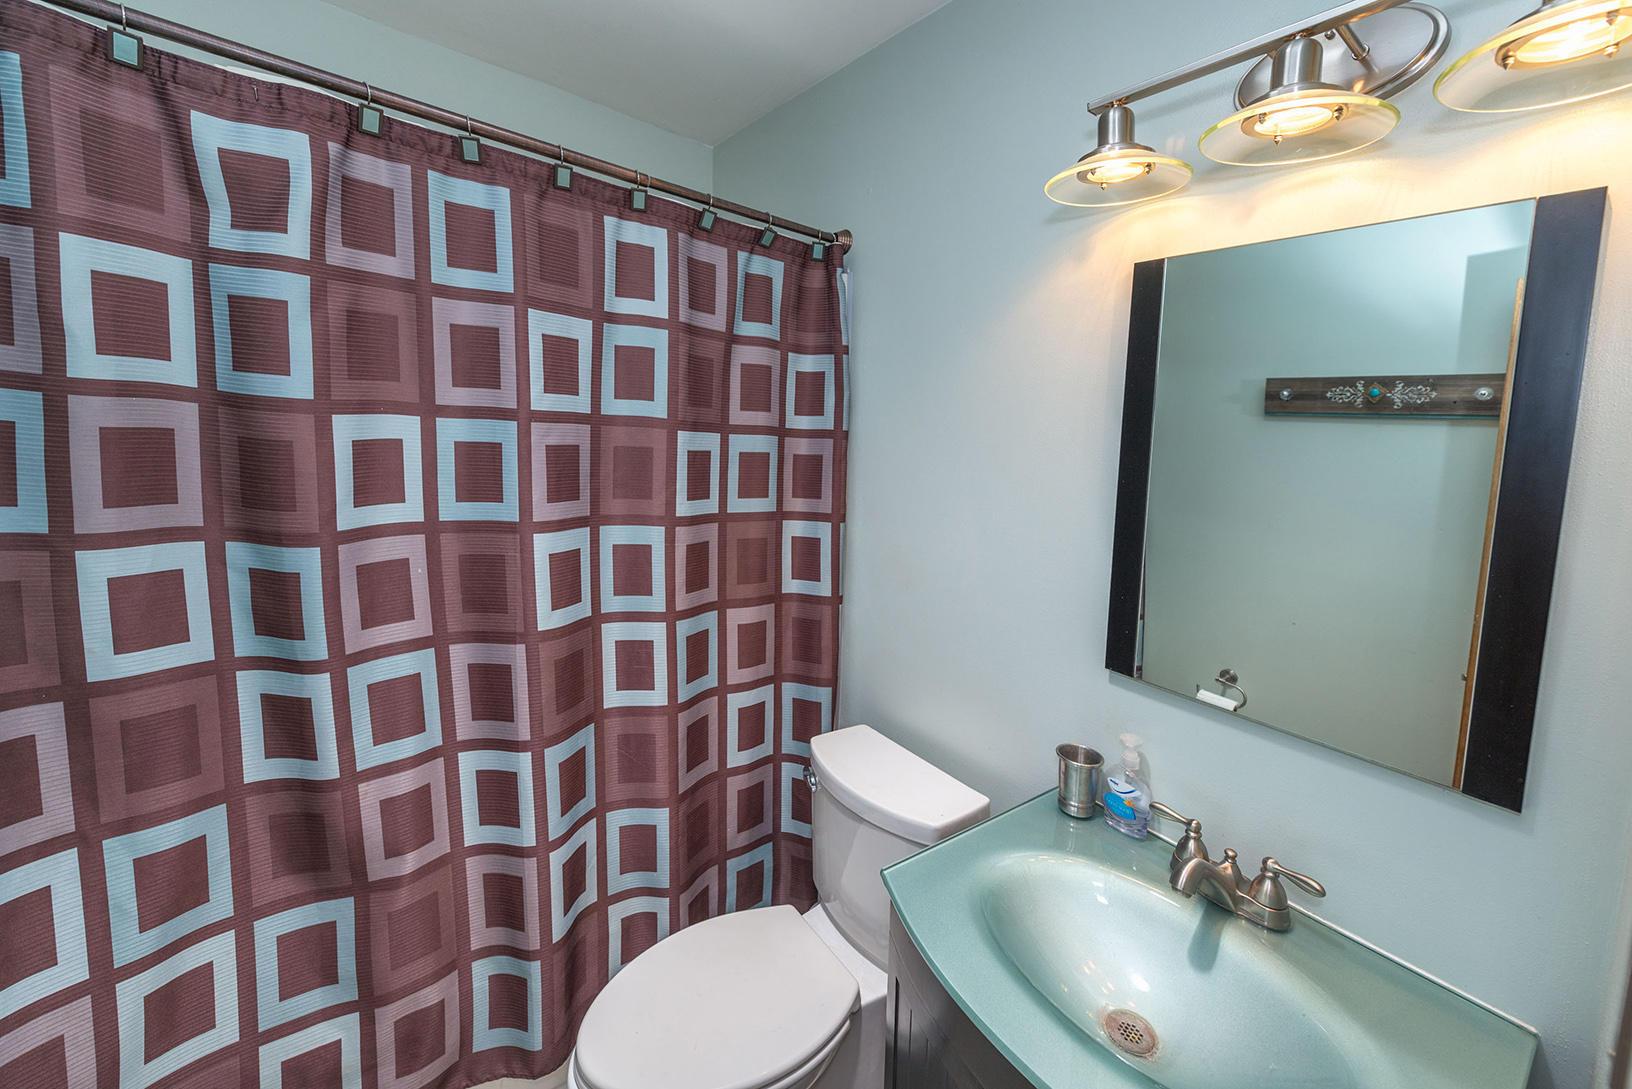 Listing: 3702 N 101st St, Wauwatosa, WI.| MLS# 1601444 | Rich ...